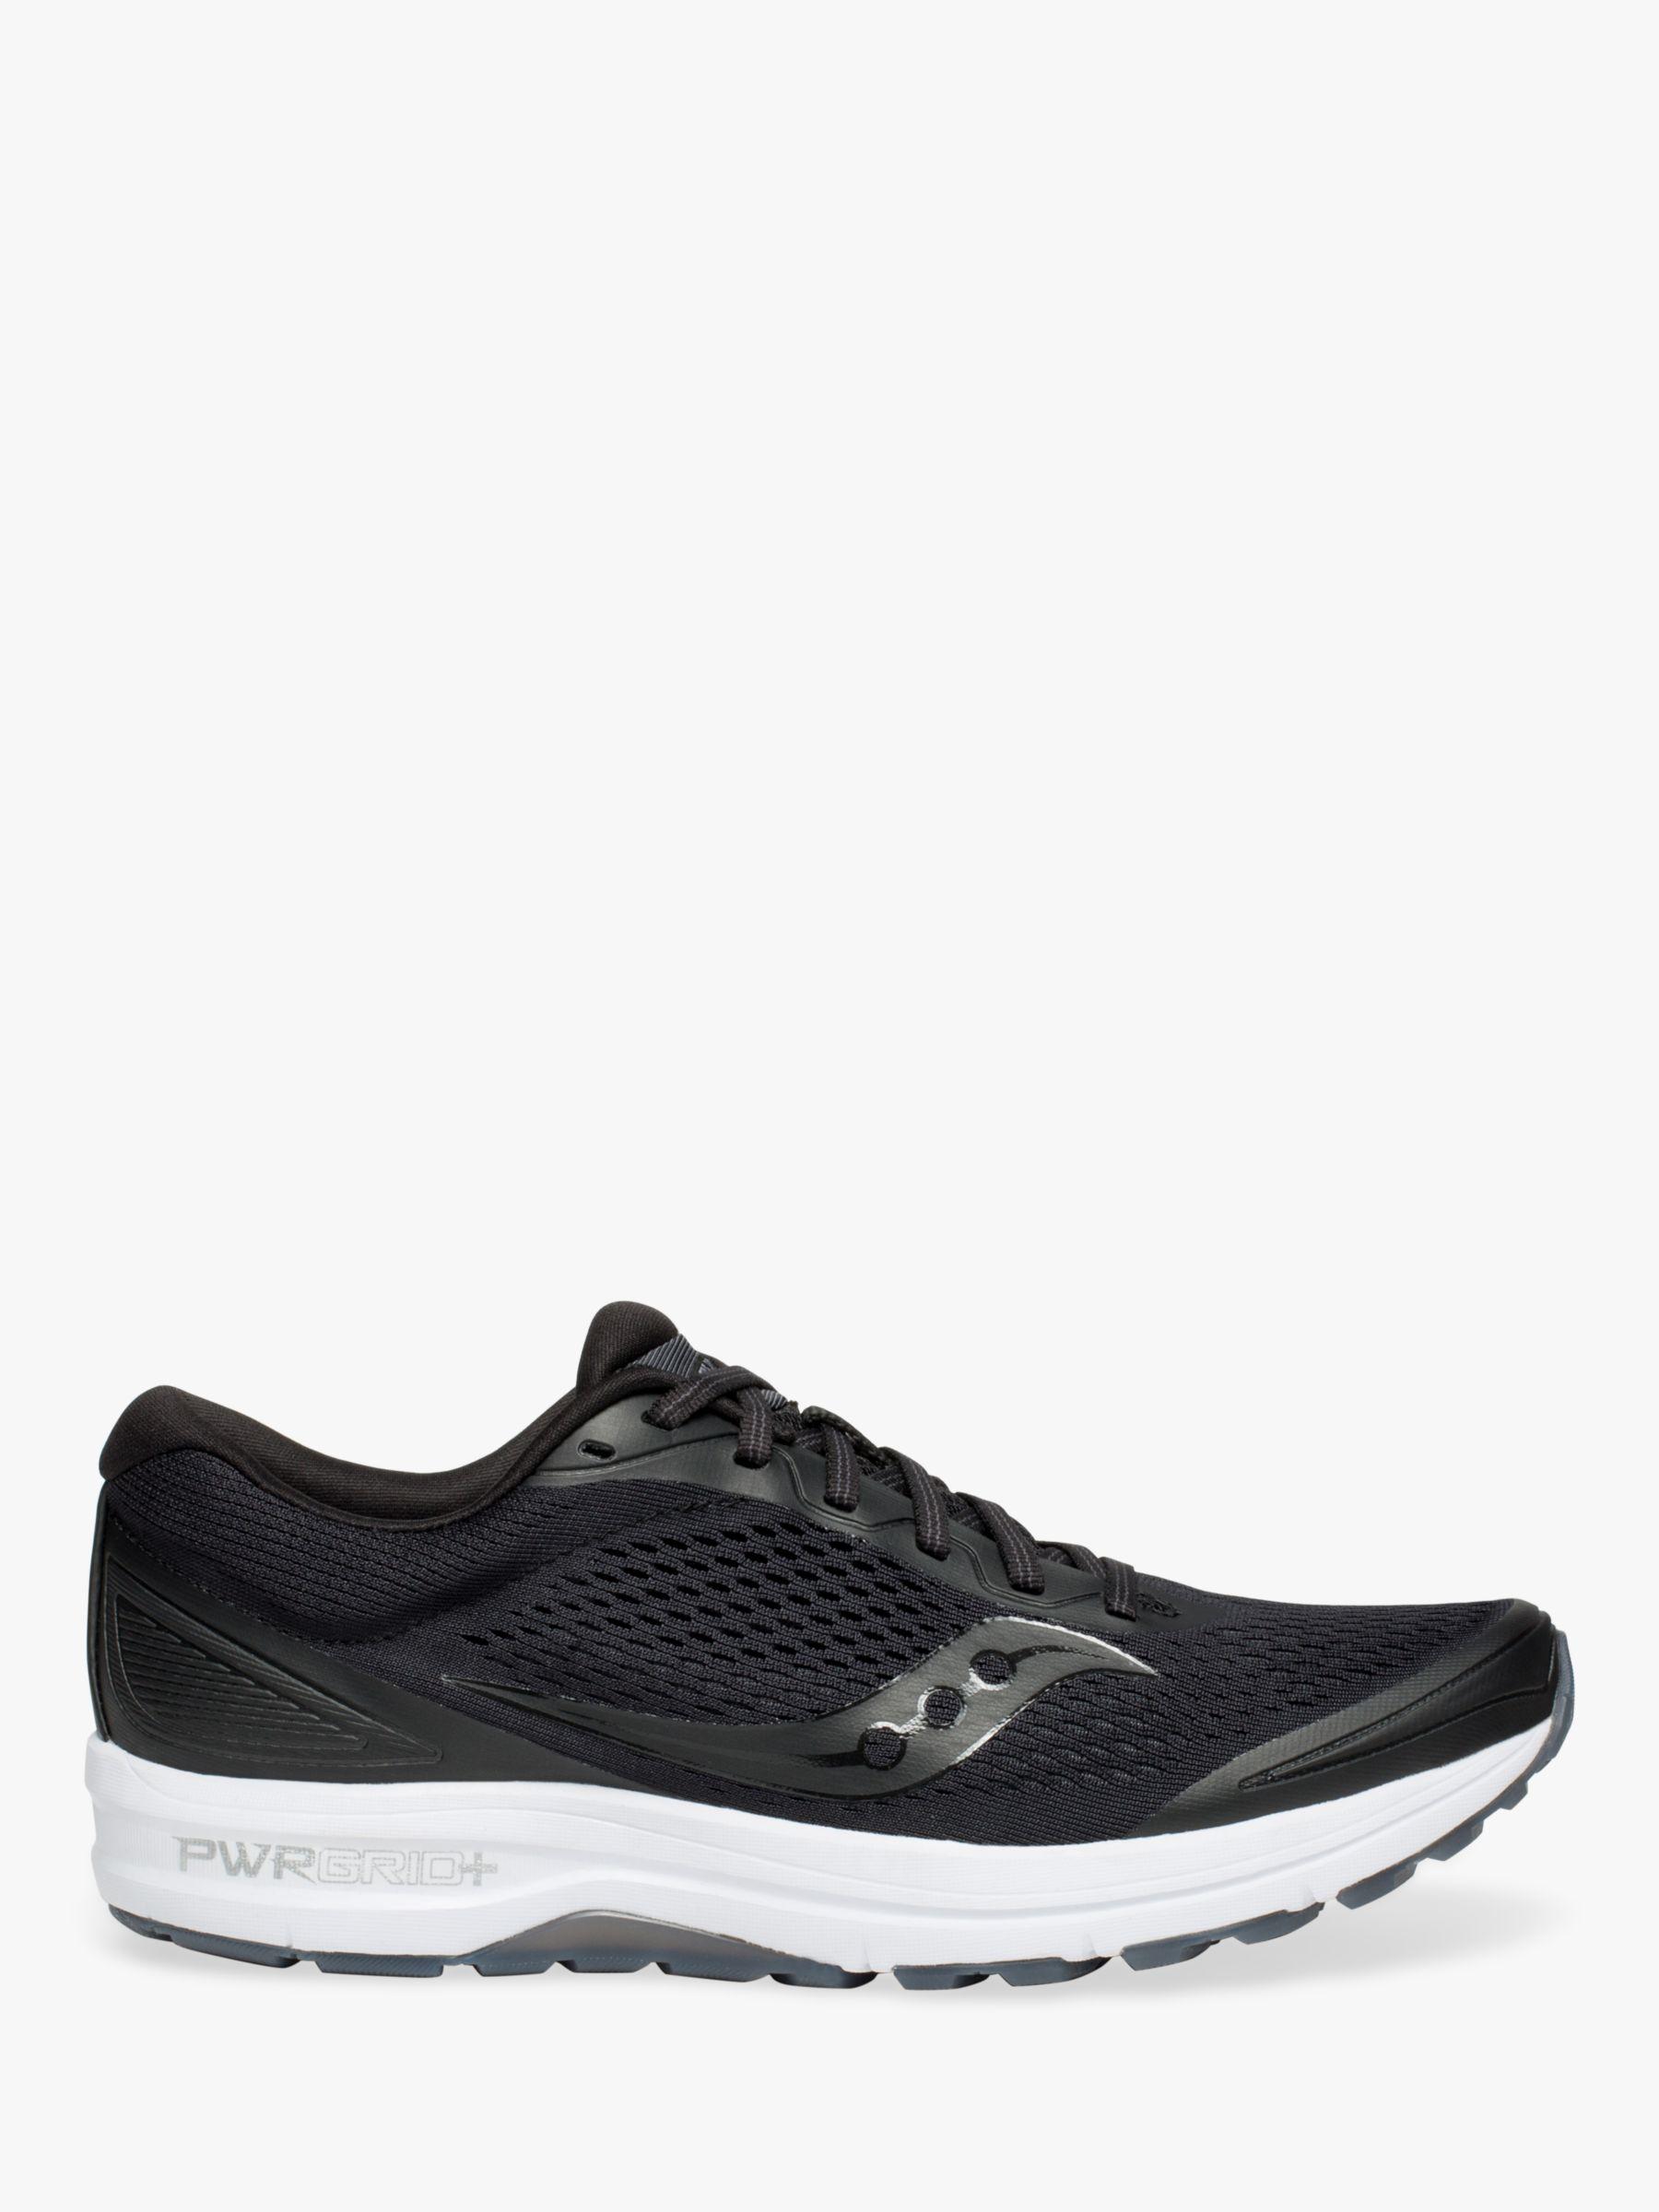 Saucony Saucony Clarion Men's Running Shoes, Black